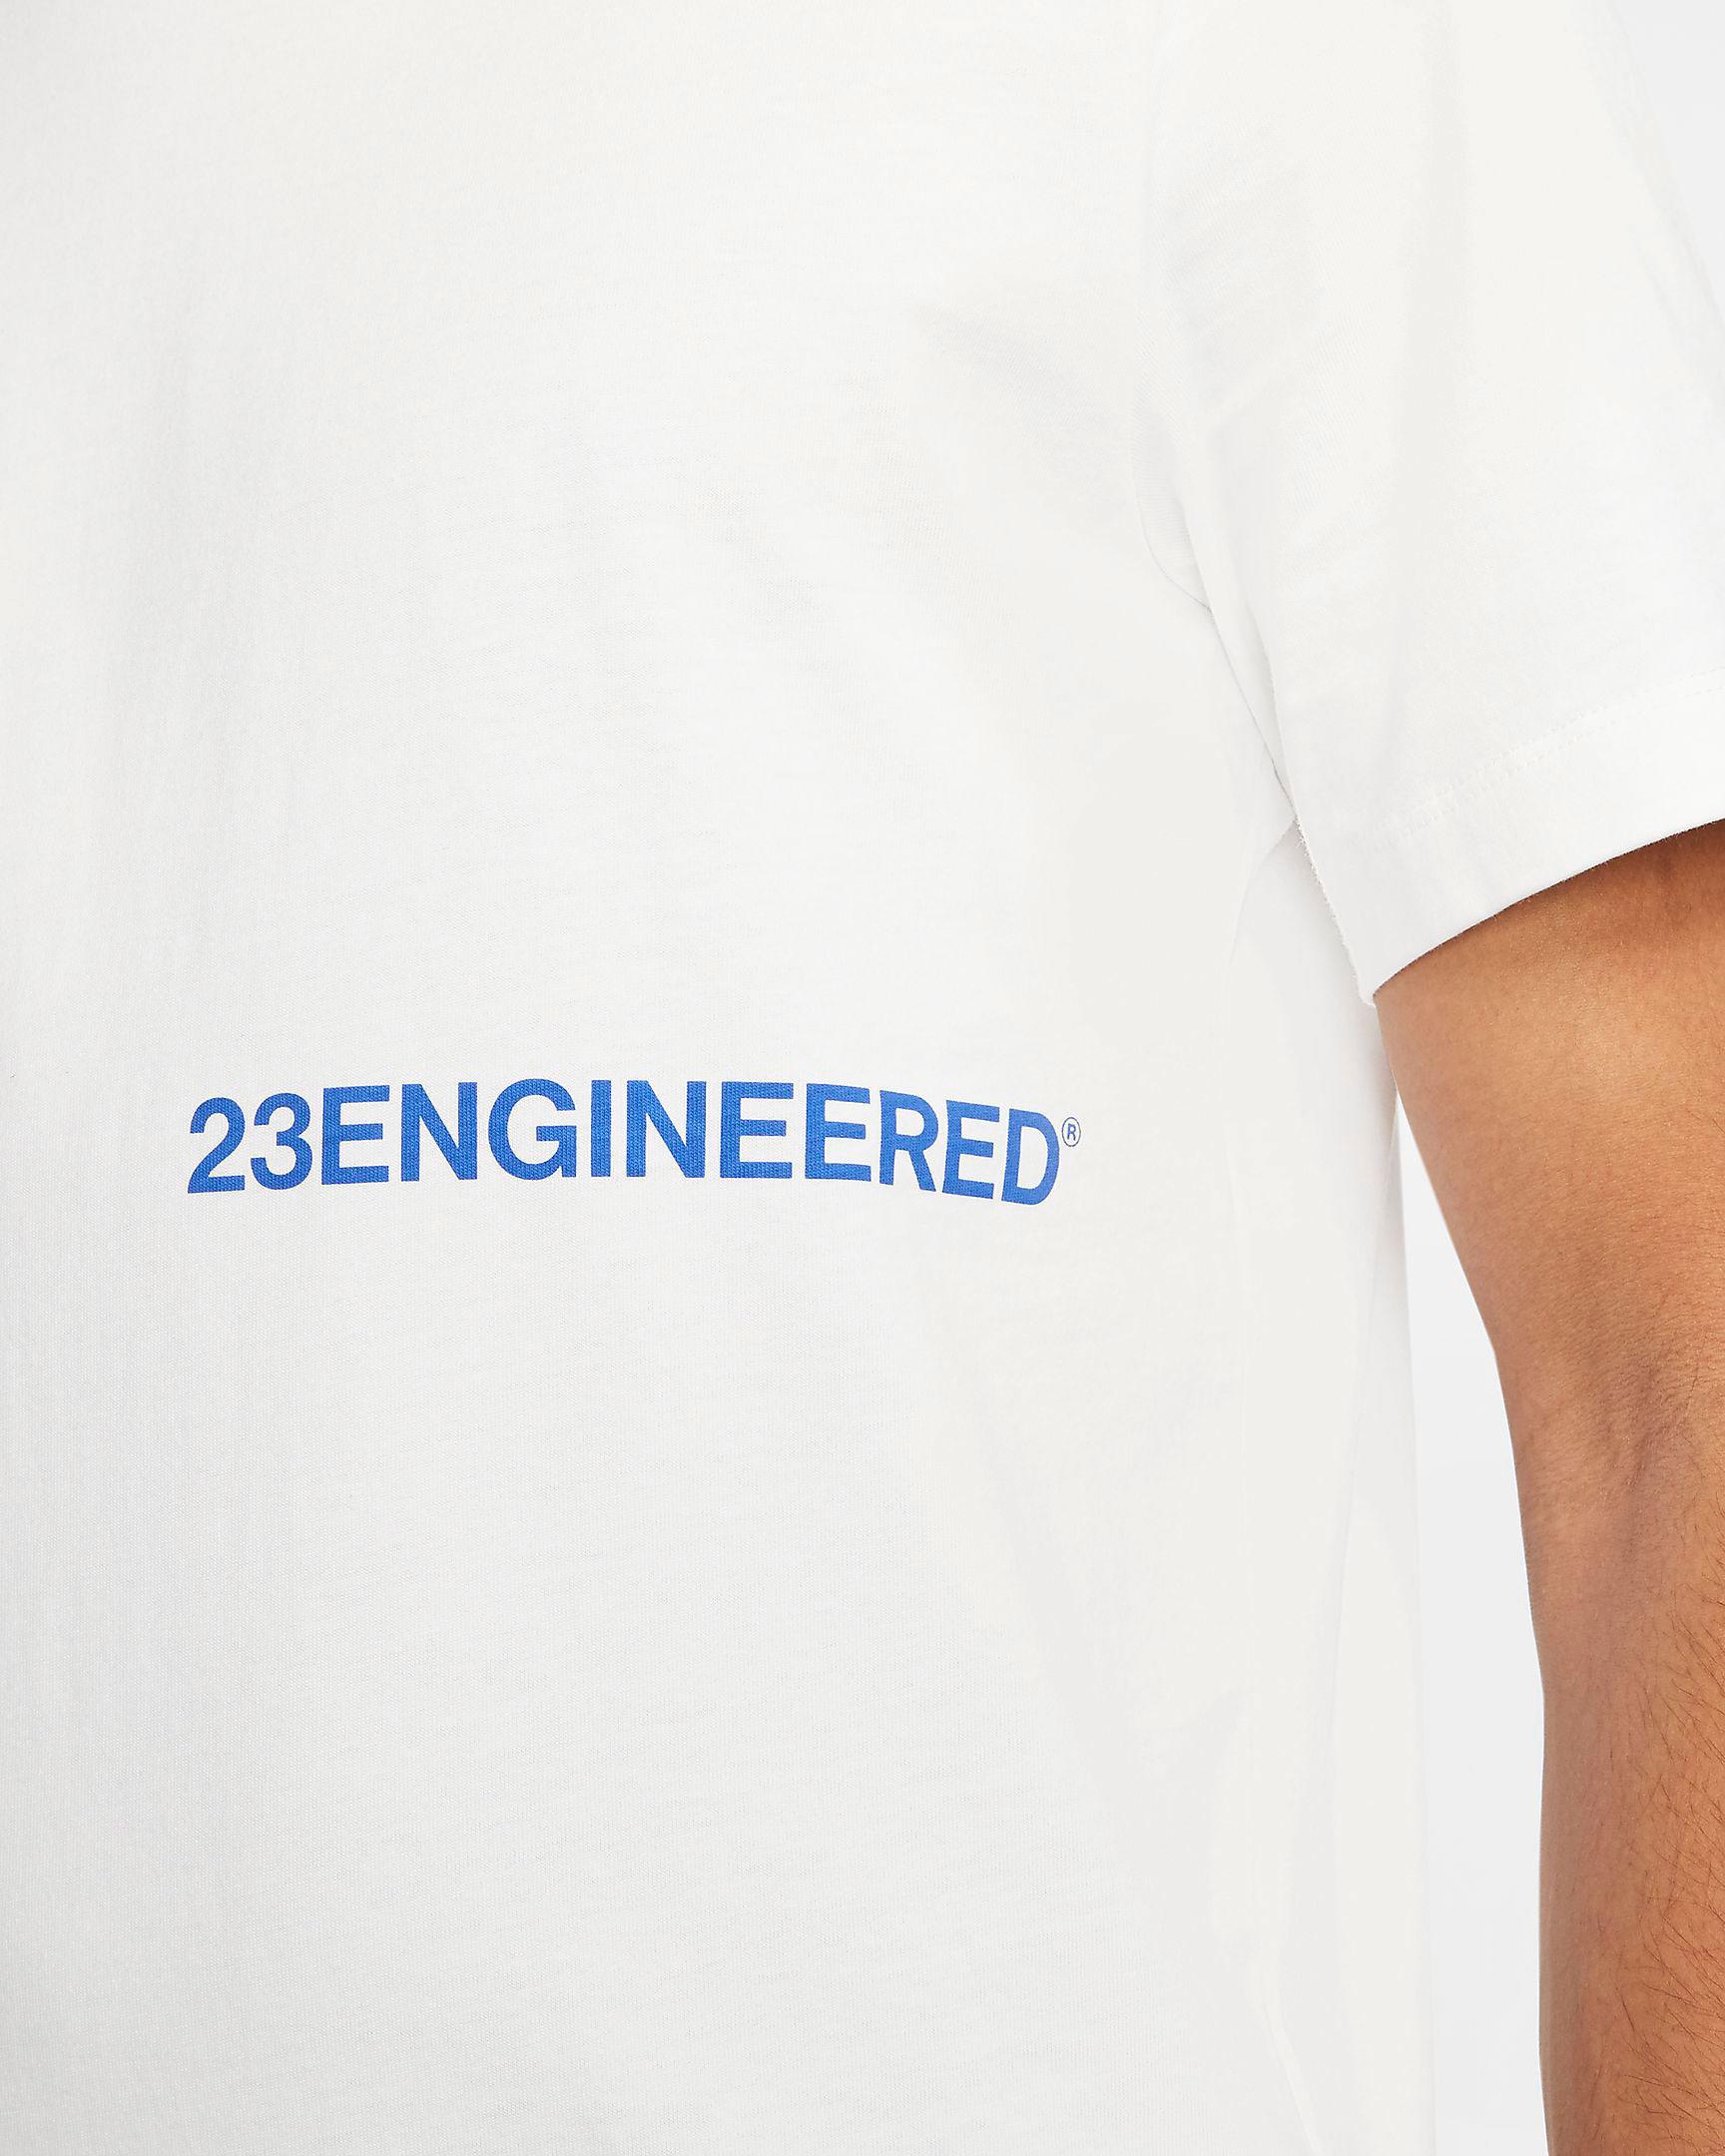 jordan-aerospace-720-lyrical-lemondade-tee-shirt-match-3